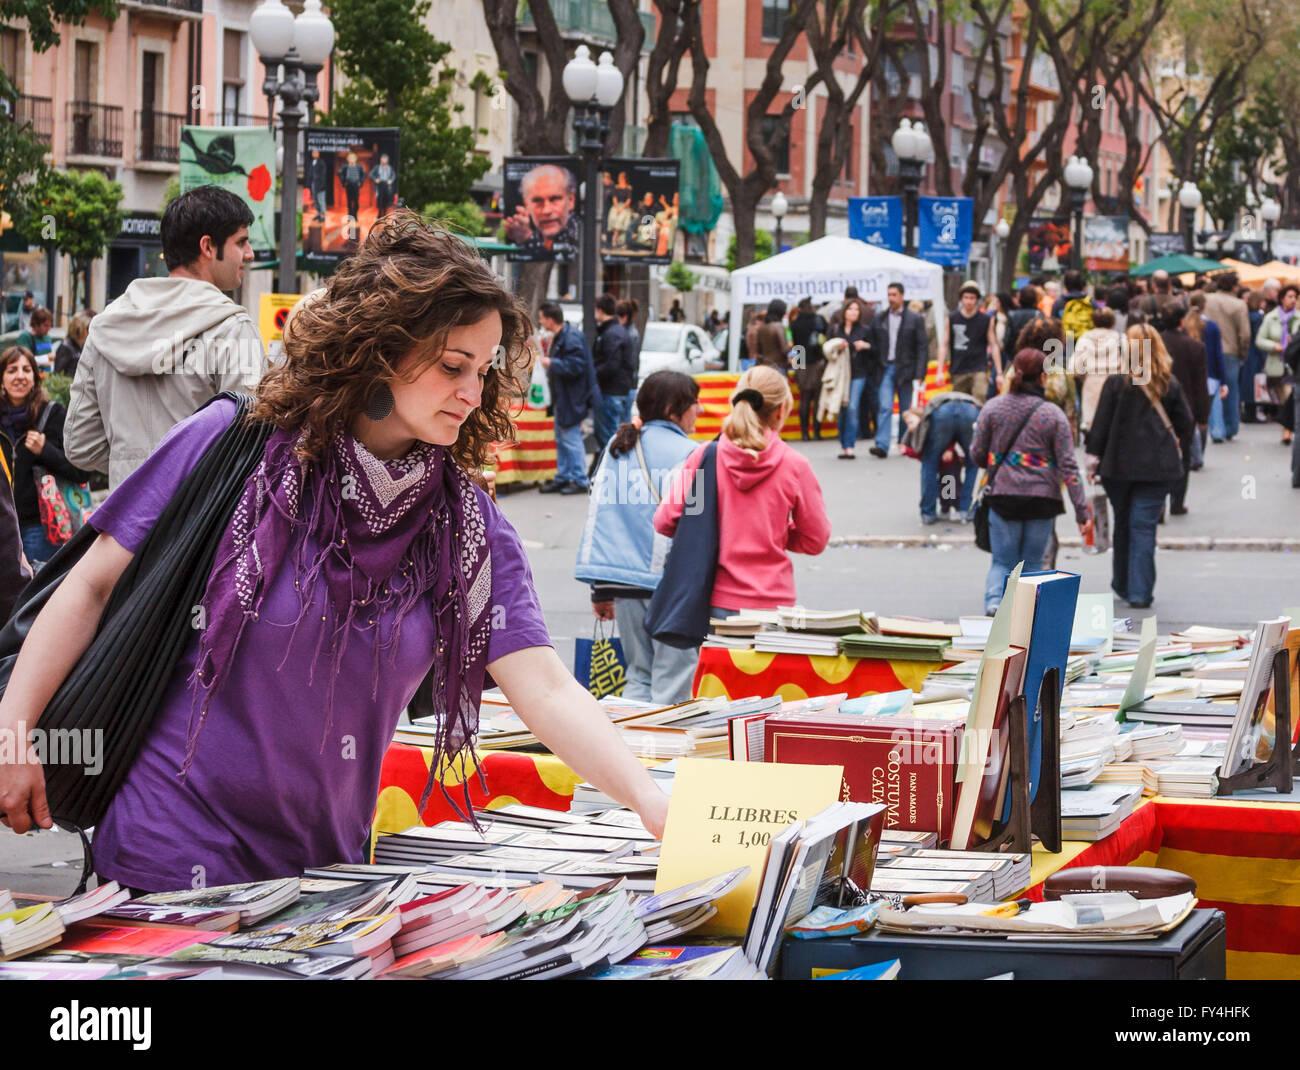 Woman browsing at street bookstall on La Rambla Nova in Tarragona, Catalonia, Spain - 23 April, Sant Jordi day - Stock Image